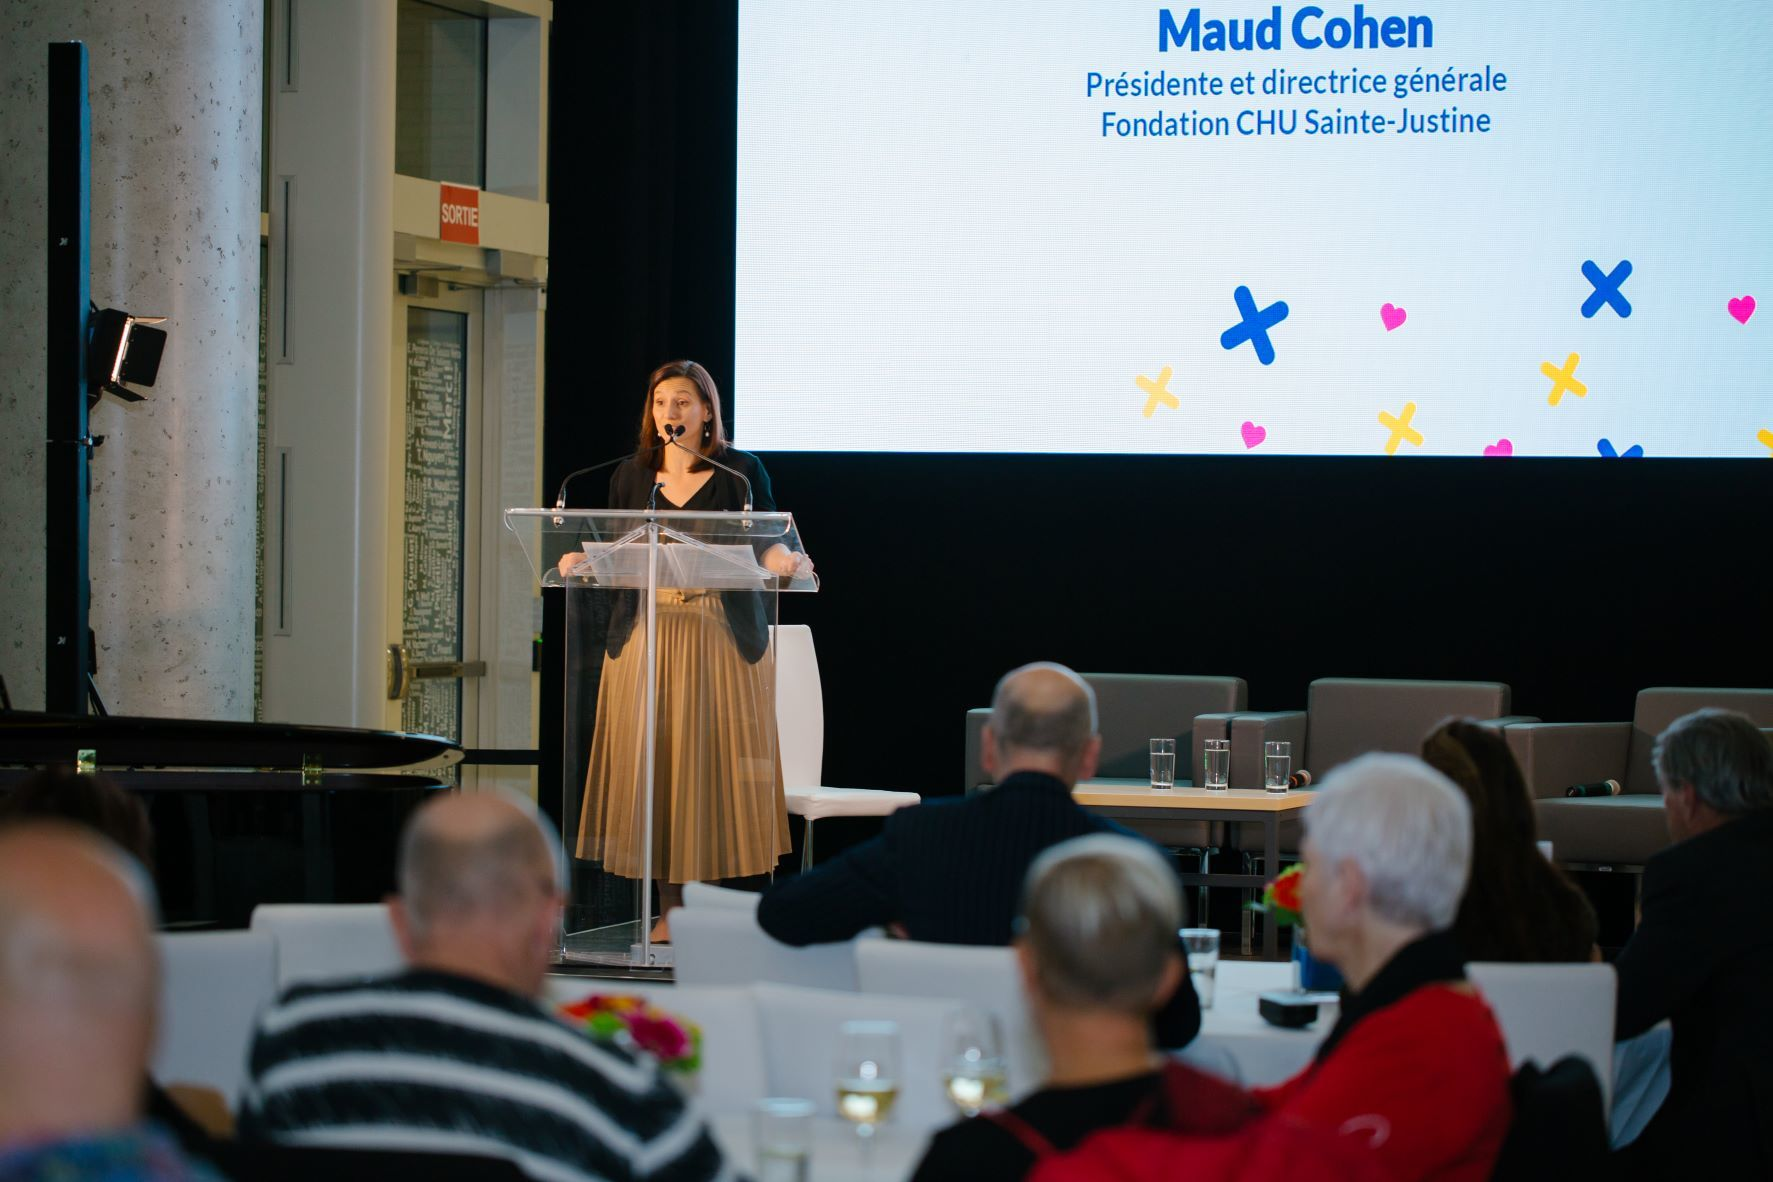 Maud Cohen PDG